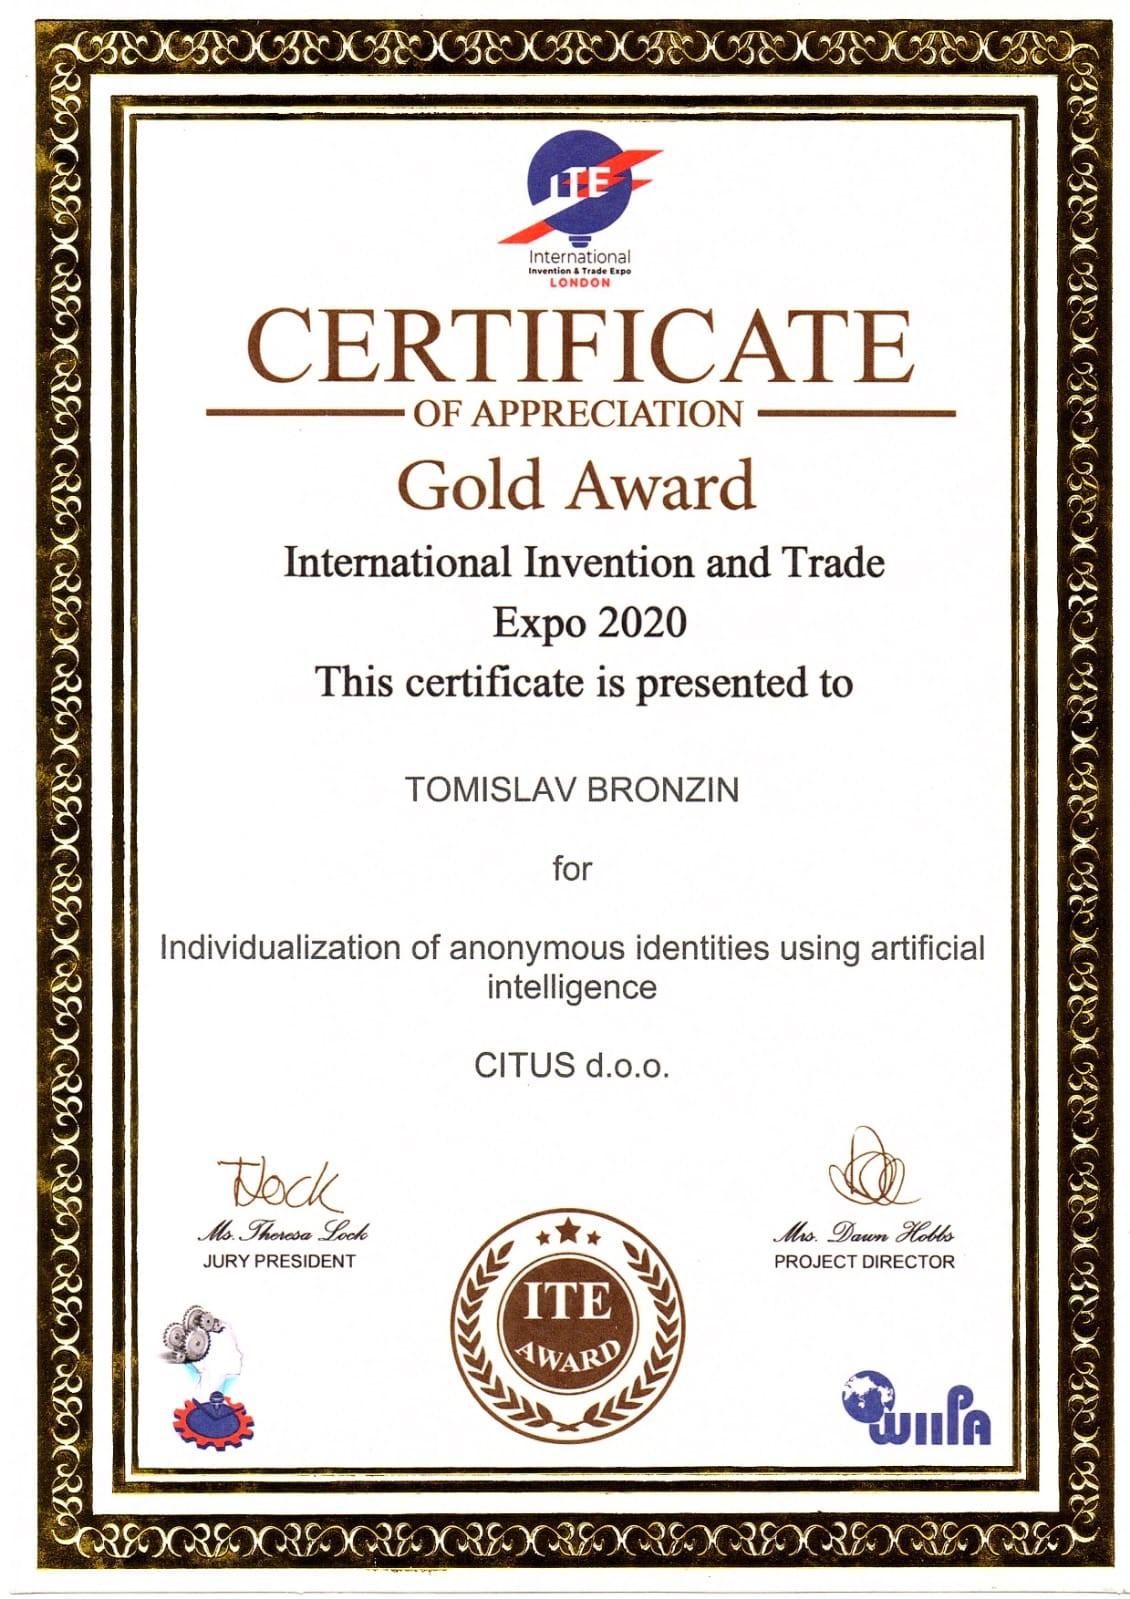 Zlatna medalja, ITE London, Velika Britanija, 2020.